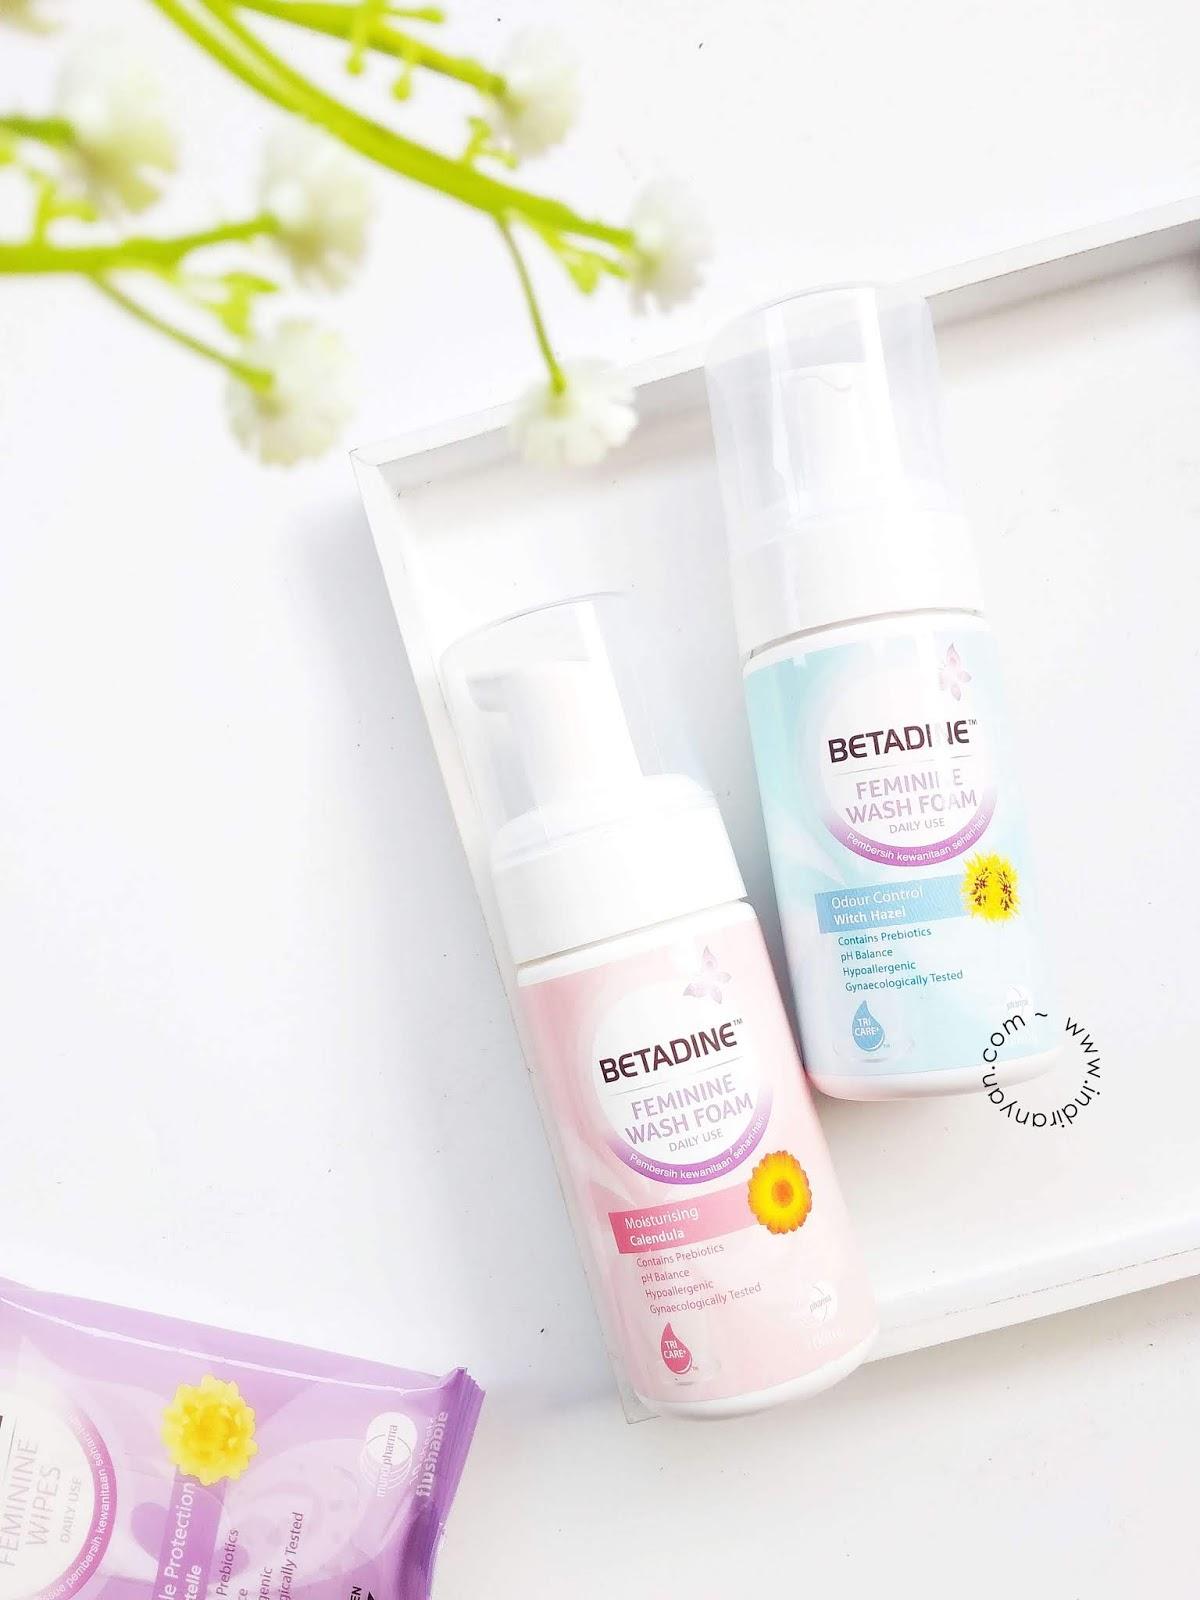 betadine-feminine-wash-foam